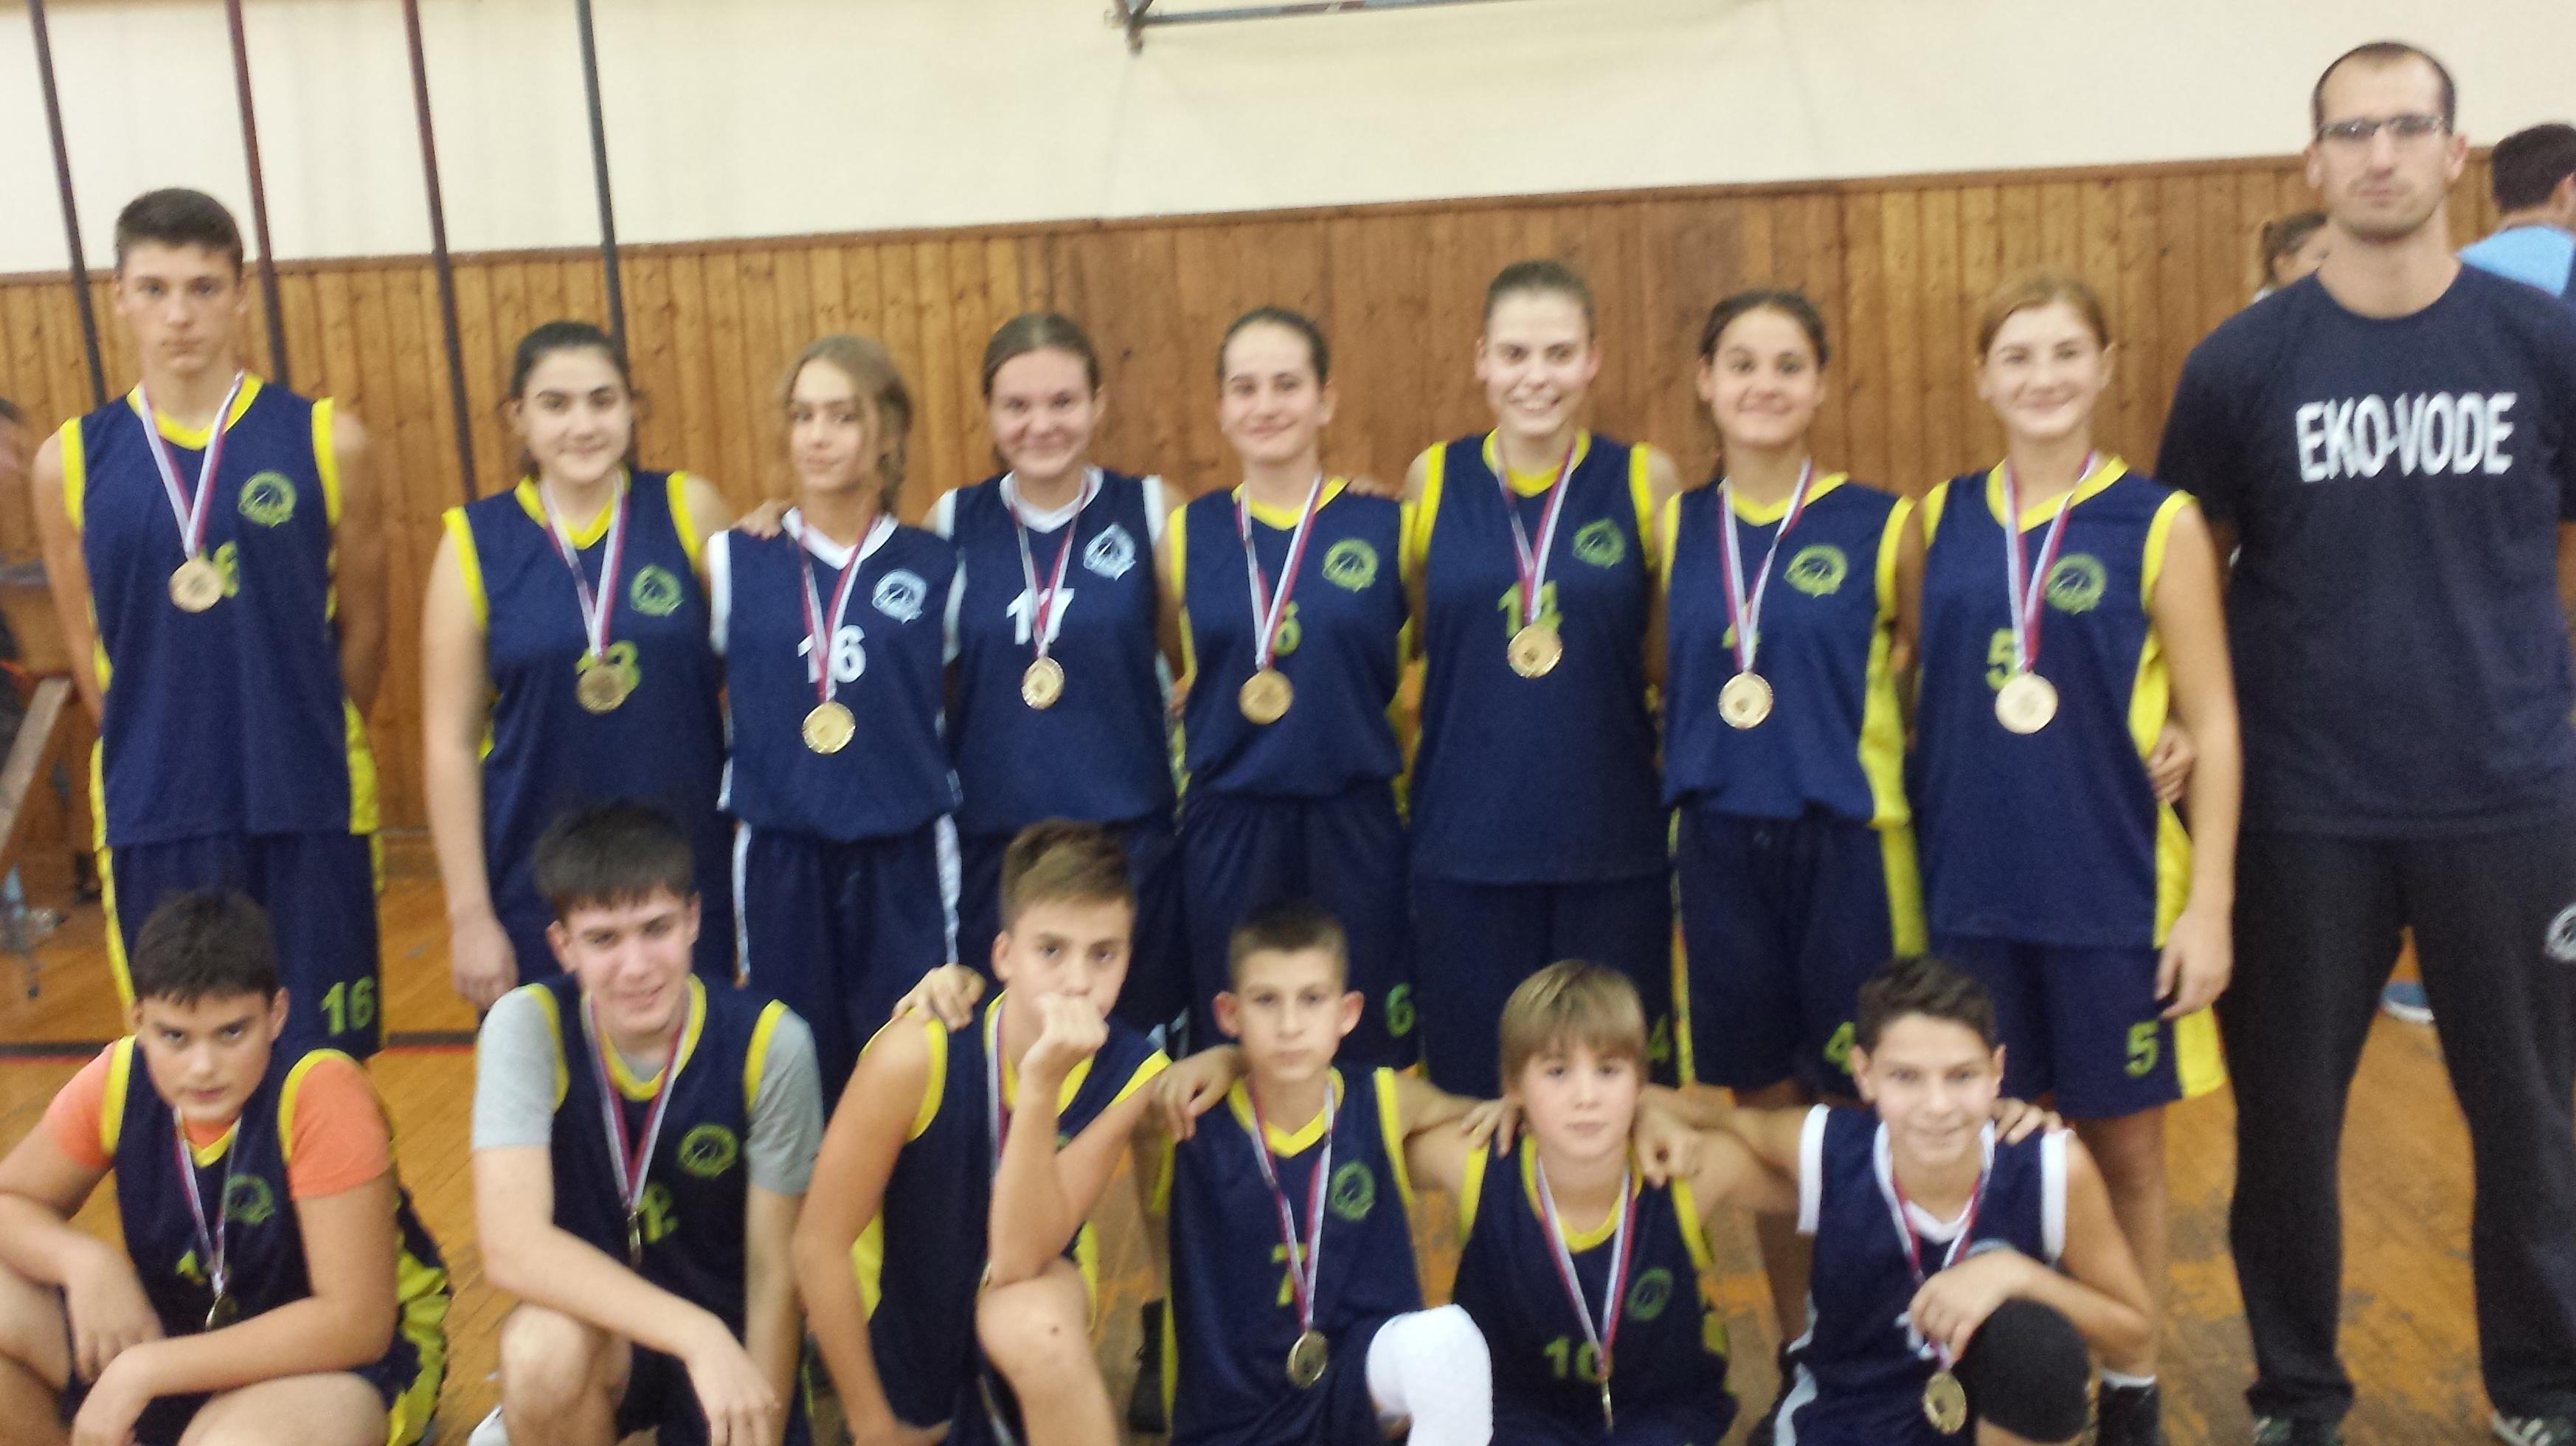 Pobednička selekcija sa turnira povodom Dana oslobođenja Bečeja | Foto: Vlastimir Jankov